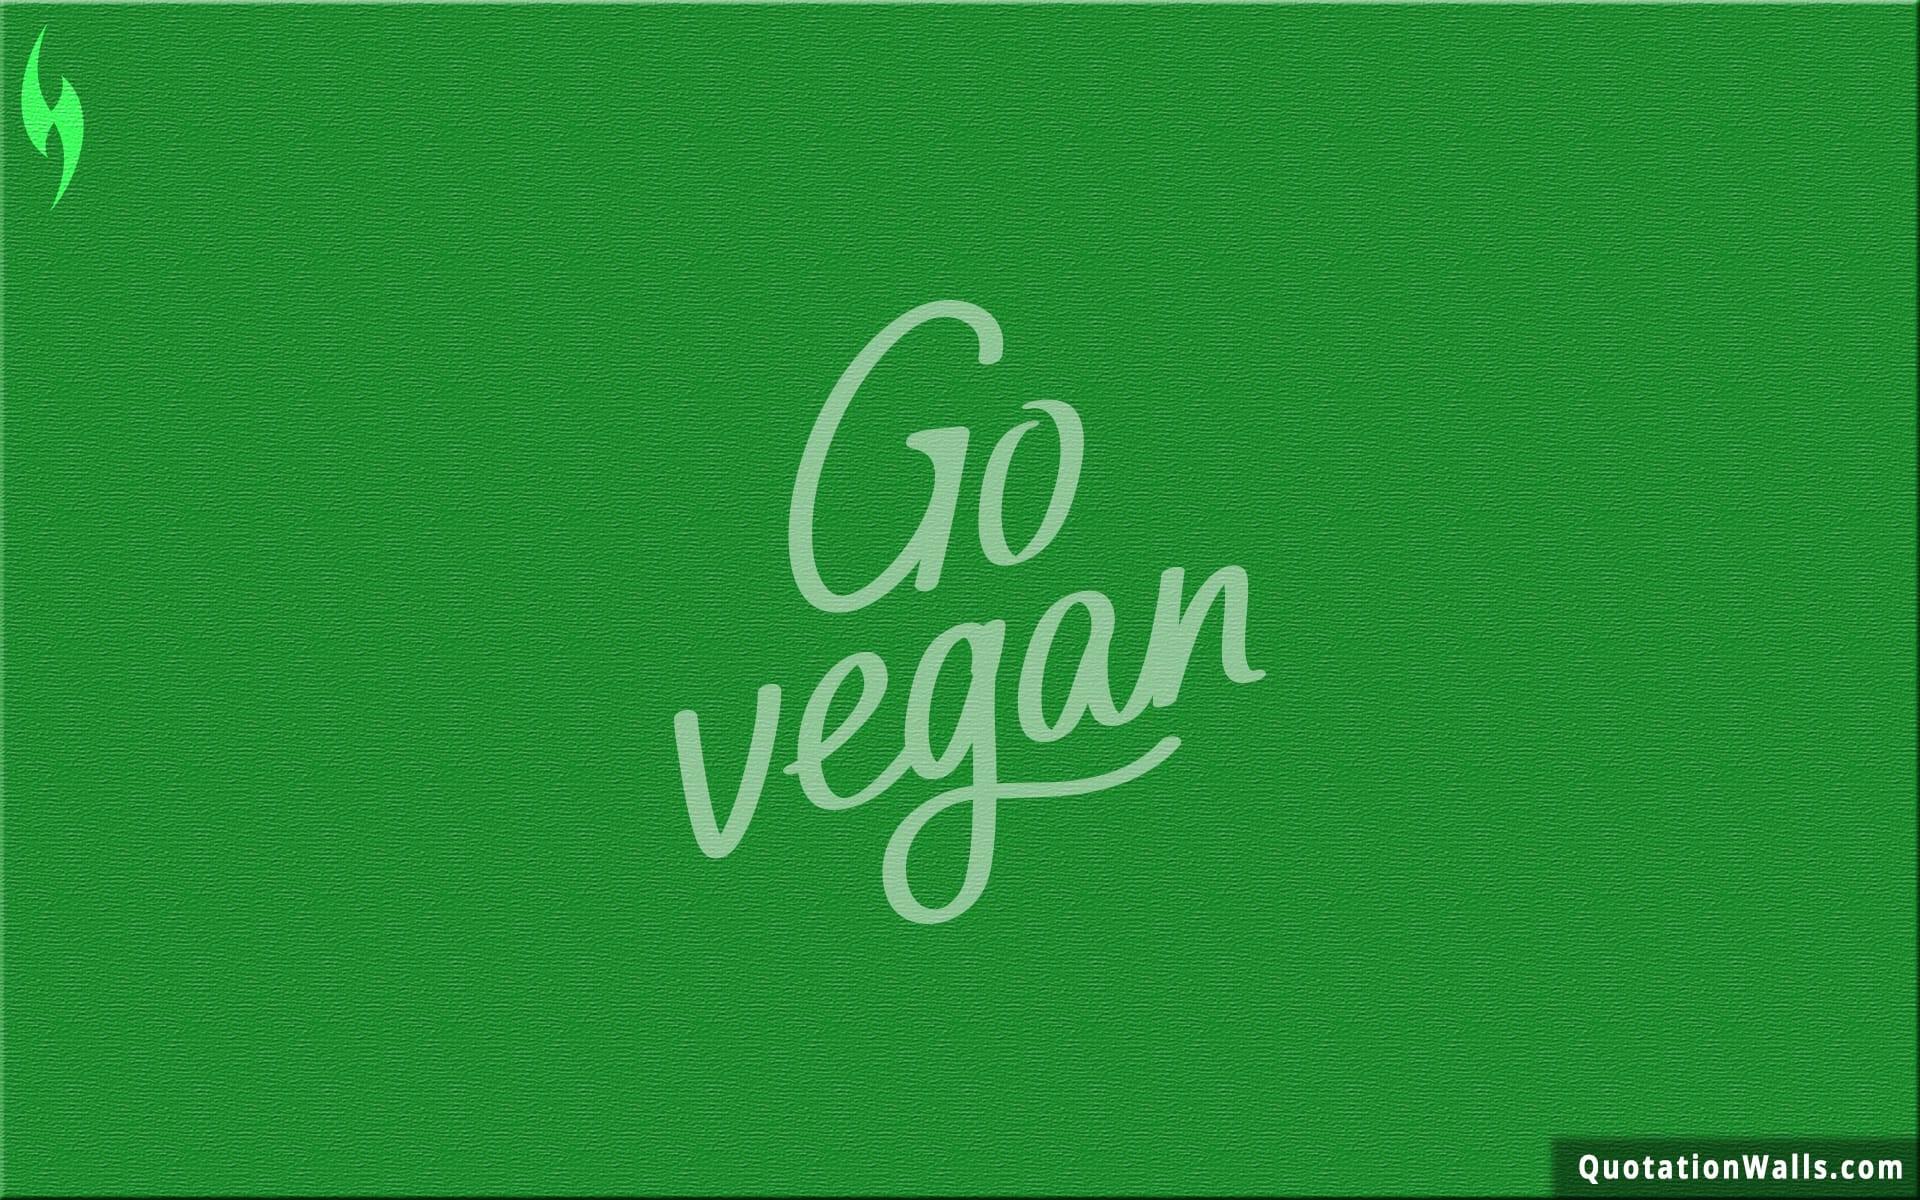 Vegan Quotes Vegan Wallpaper 79 Images